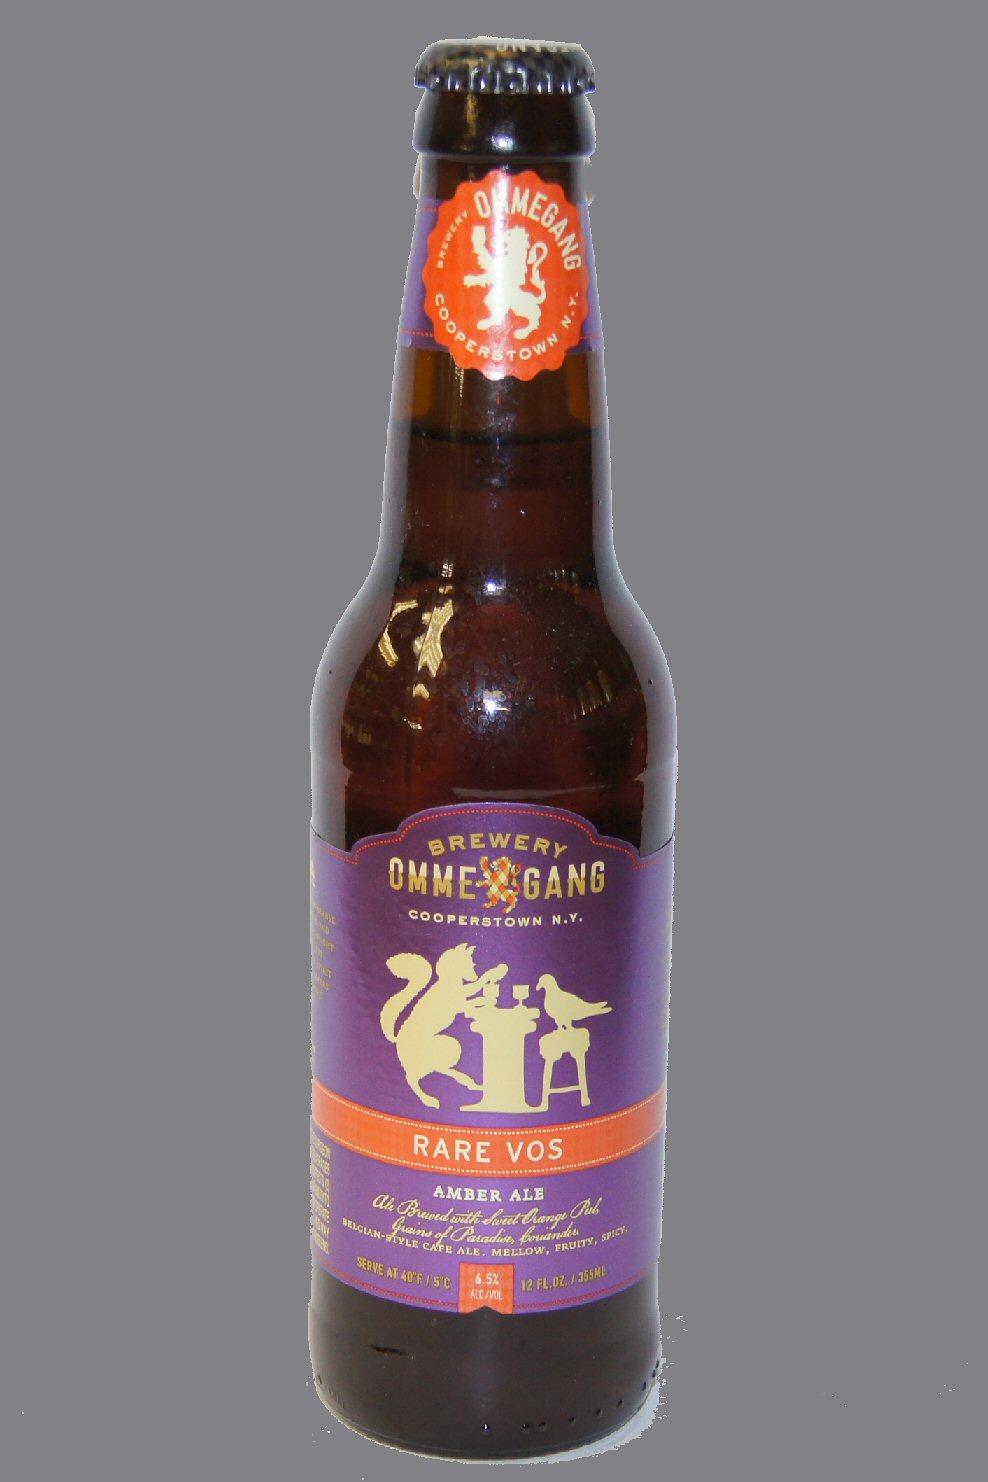 OMME GANG -Amber ale.jpg